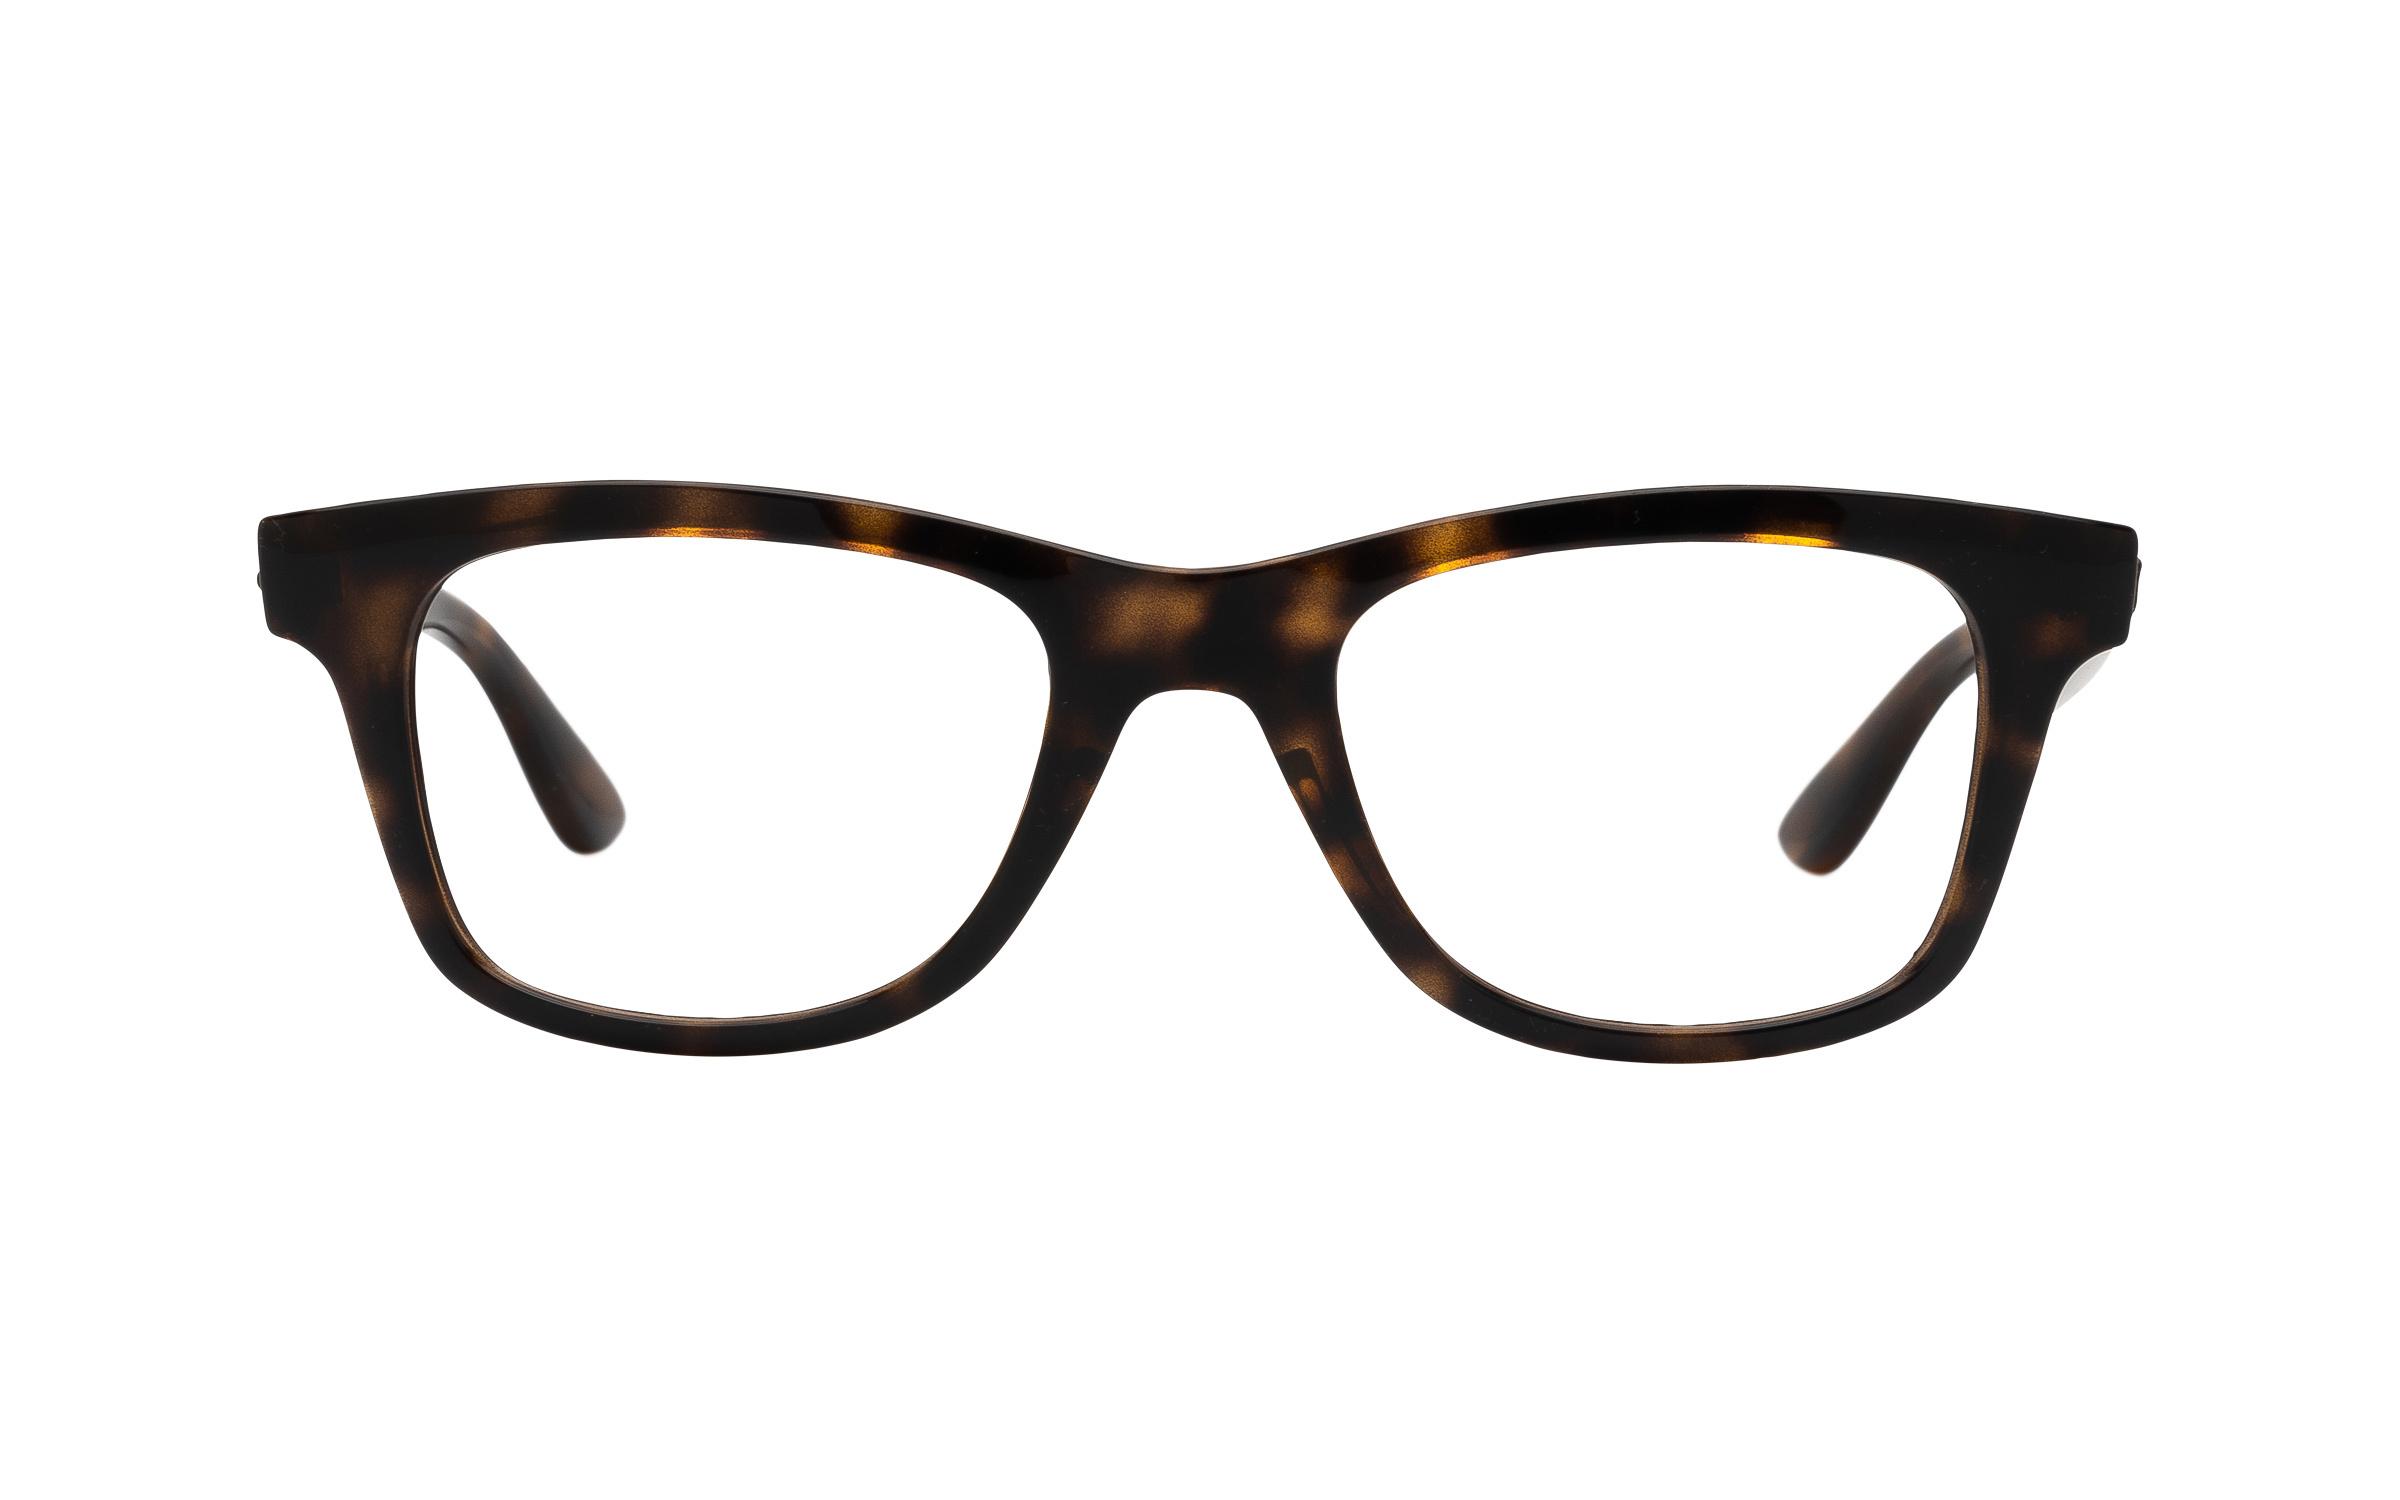 http://www.coastal.com/ - Ray-Ban RX4640V 2012 (50) Eyeglasses and Frame in Havana Brown/Tortoise – Online Coastal